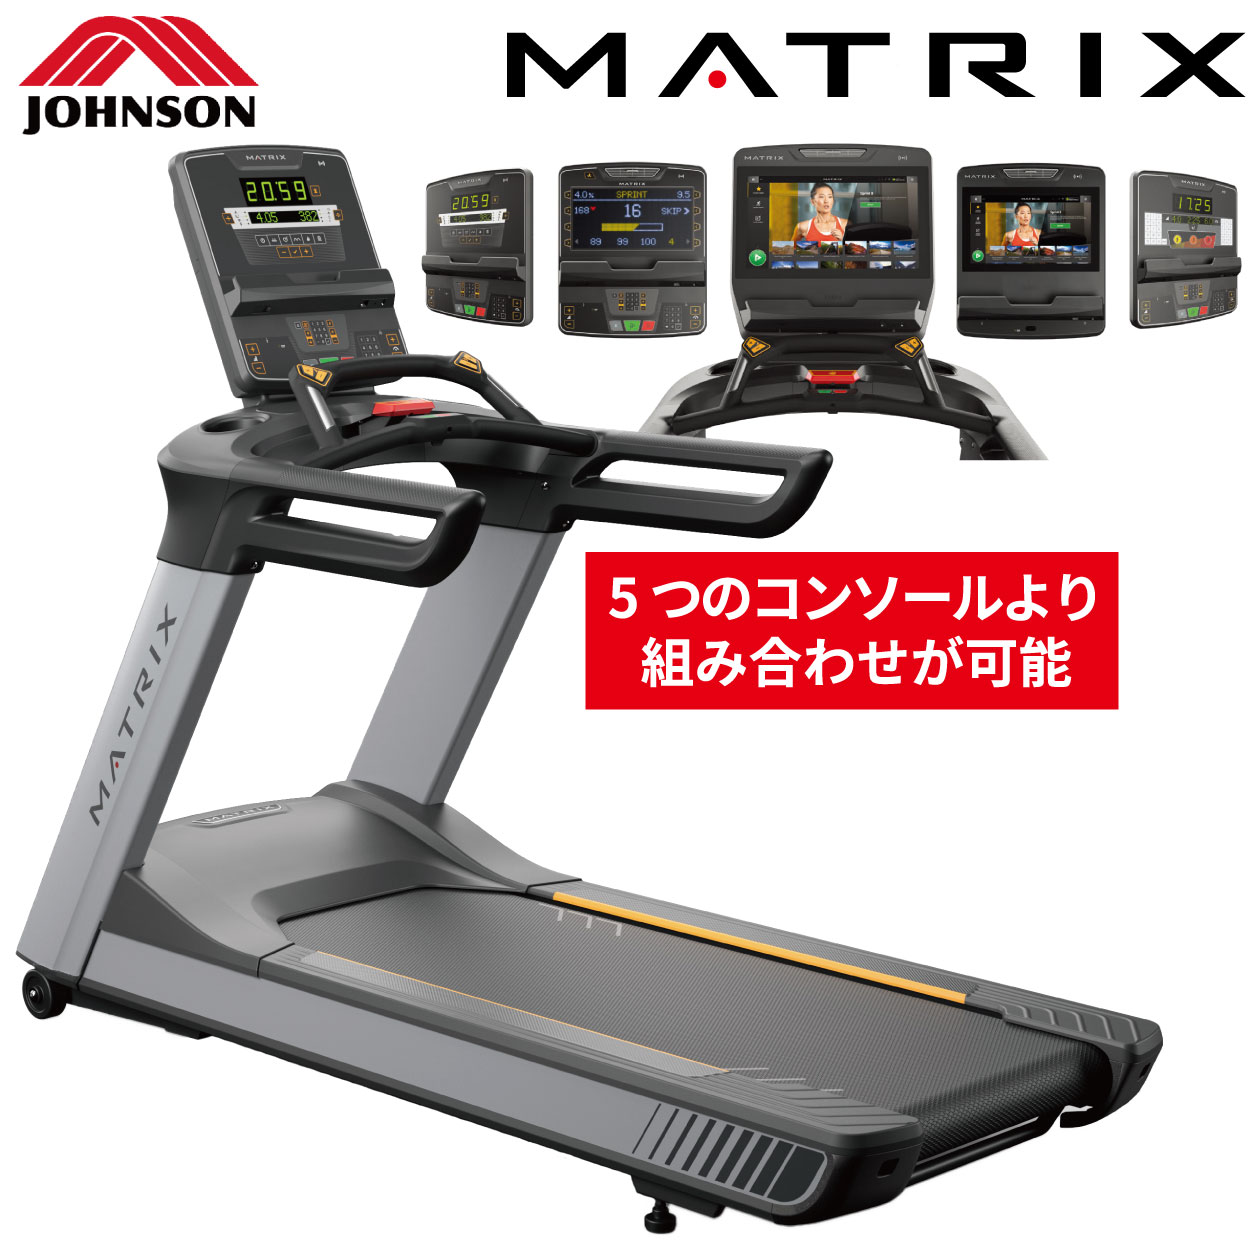 PERFORMANCE(パフォーマンスシリーズ)/業務用ランニングマシン〈業務用MATRIX〉《ジョンソンヘルステック》